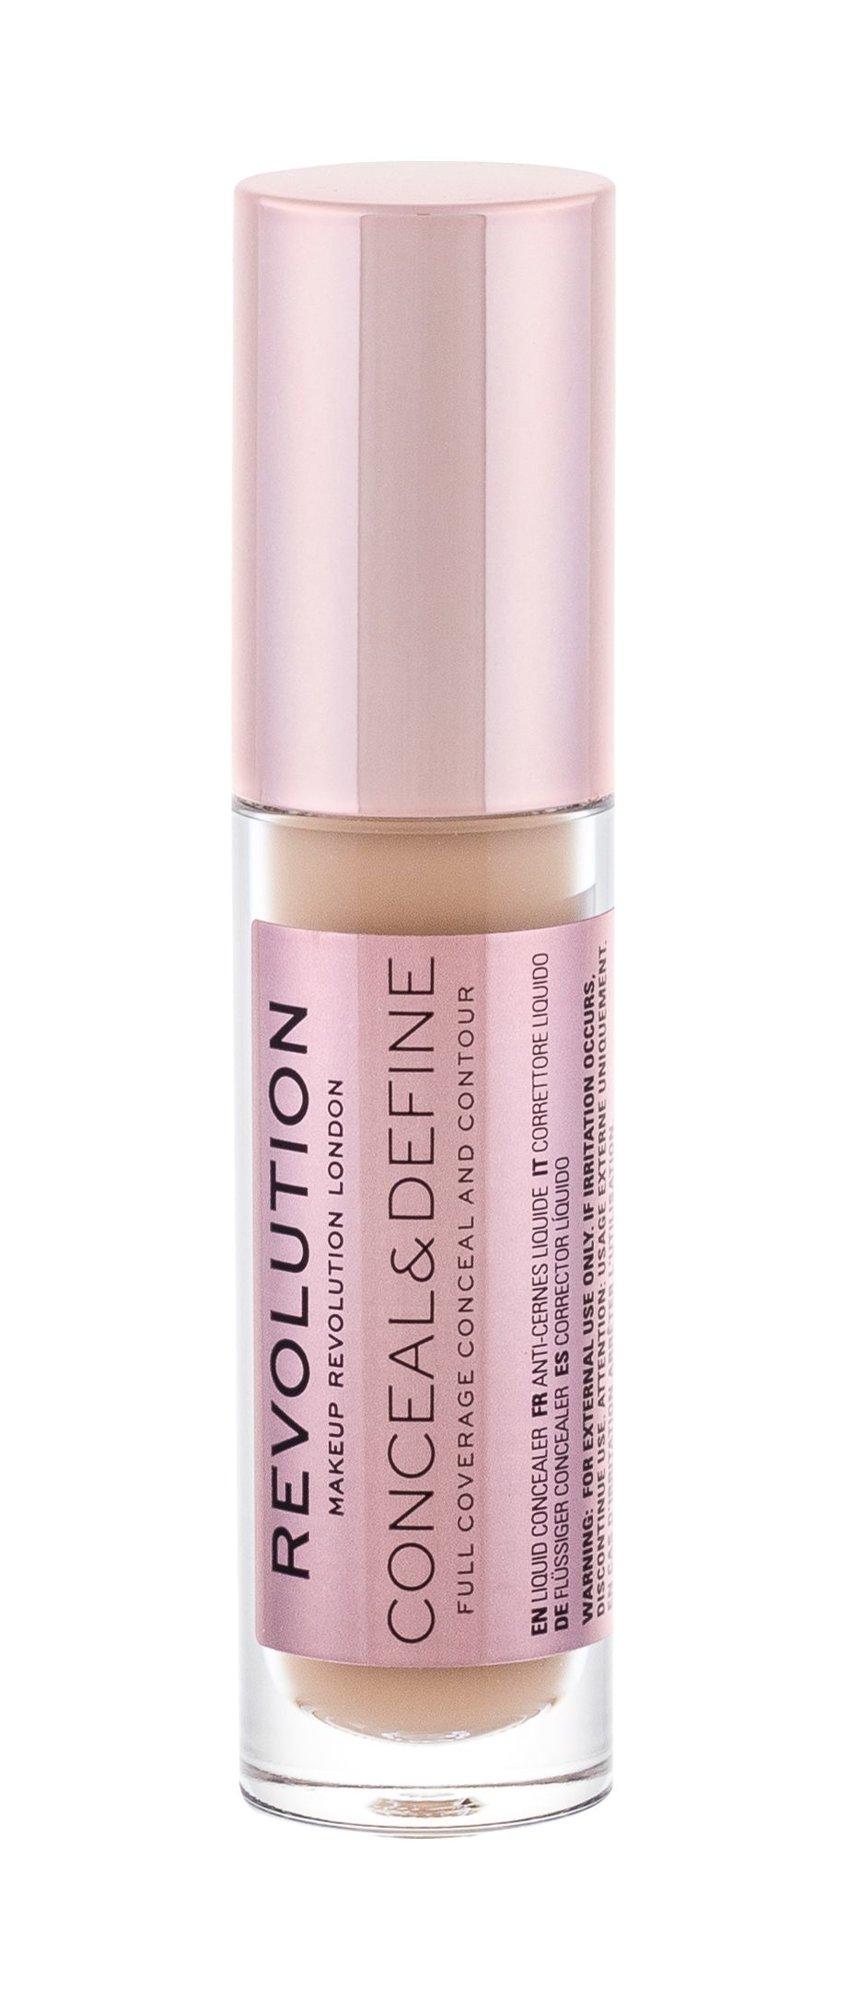 Makeup Revolution London Conceal & Define Corrector 4ml C10